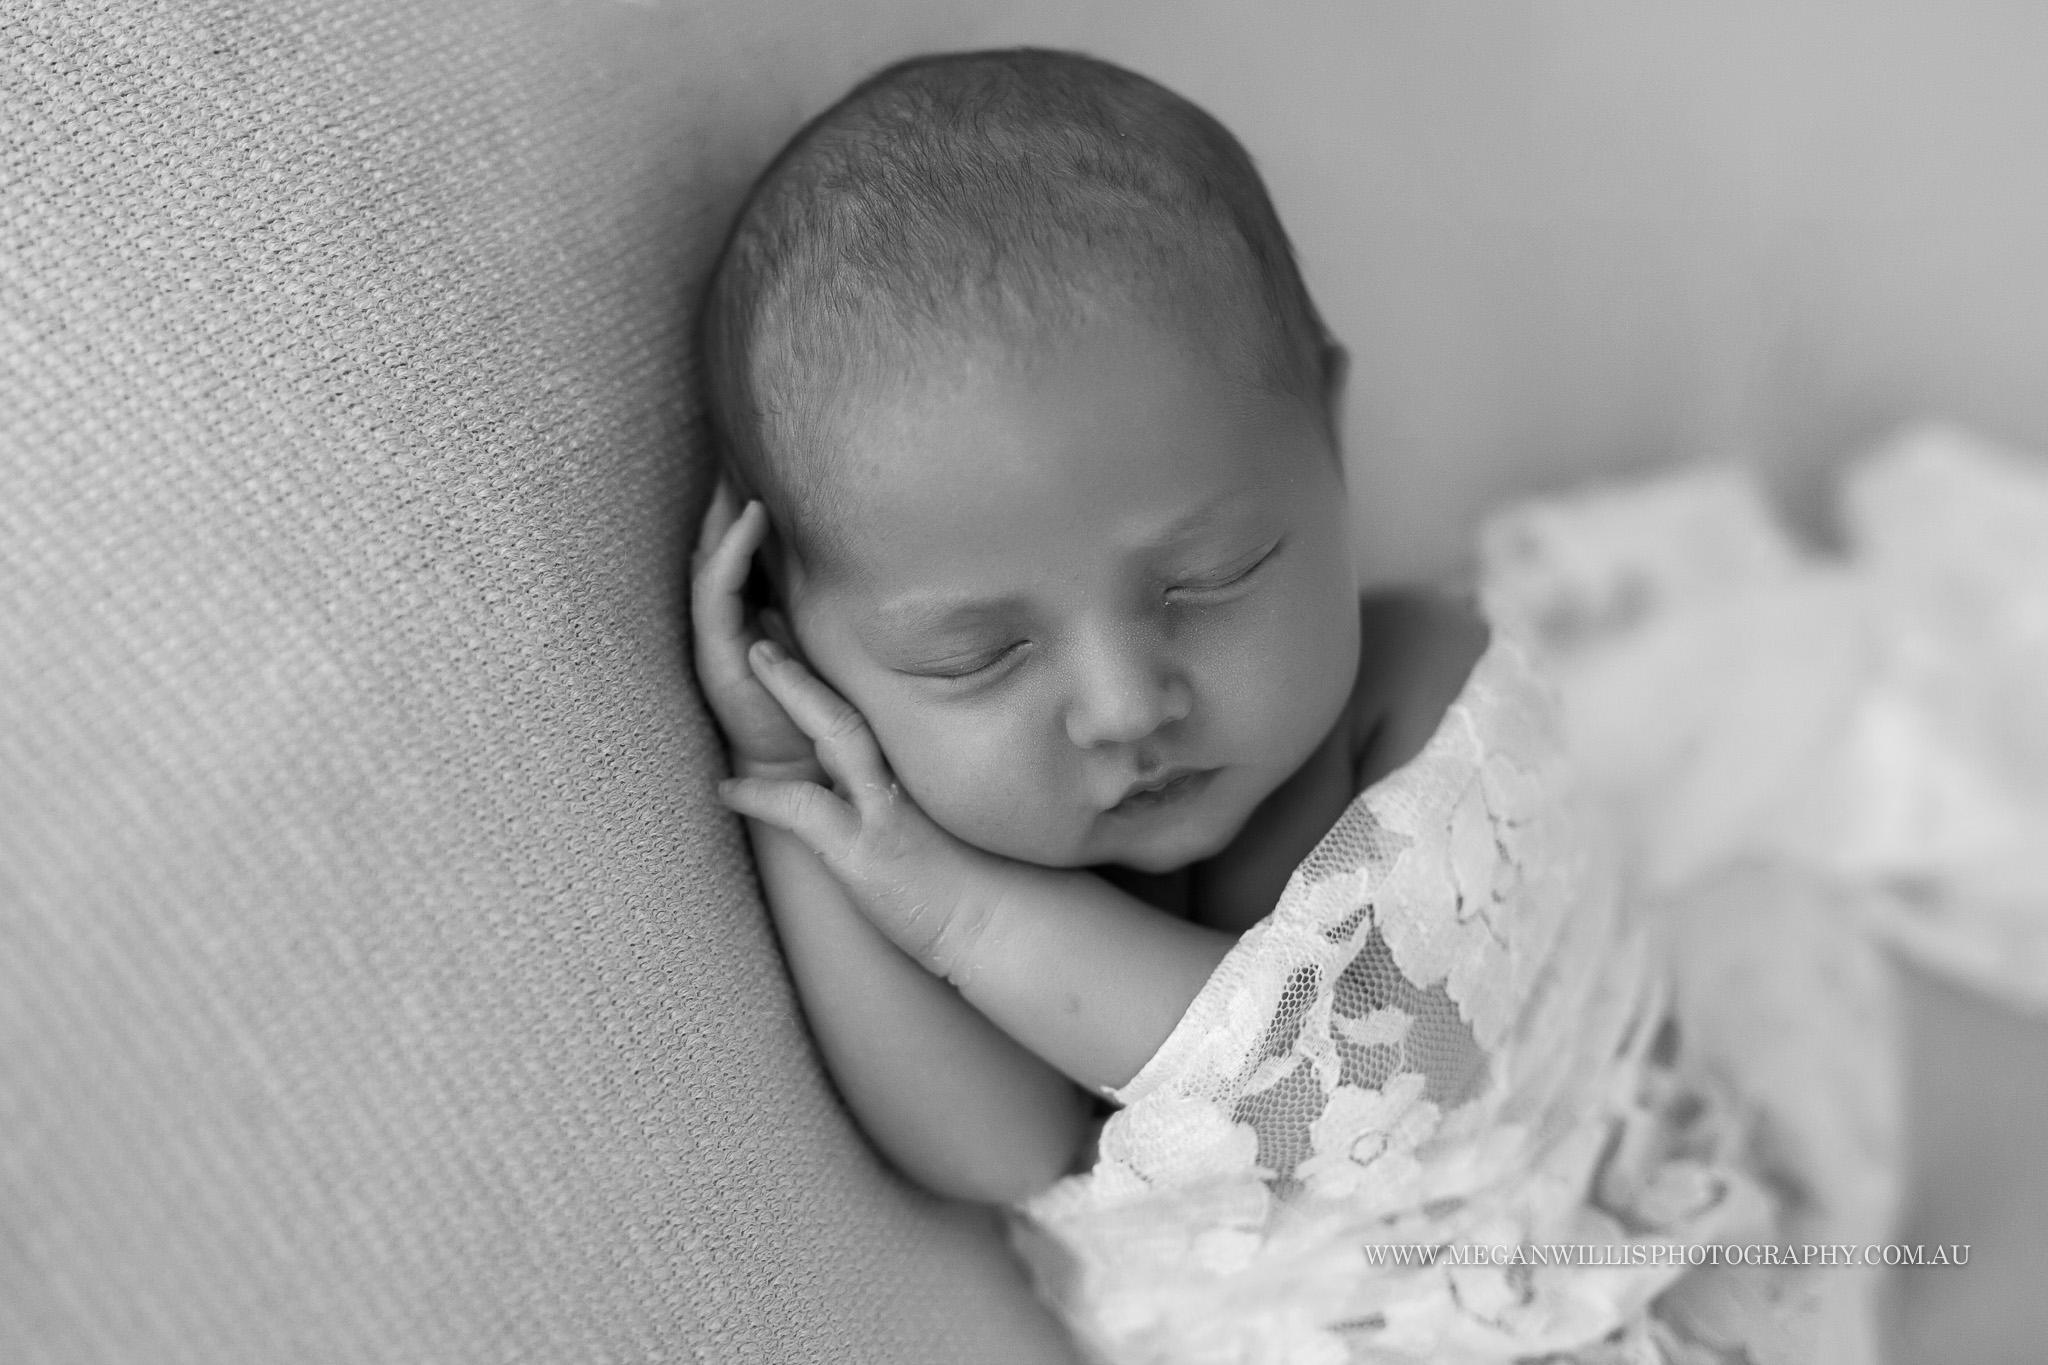 Molly // 11 days // Newborn Session